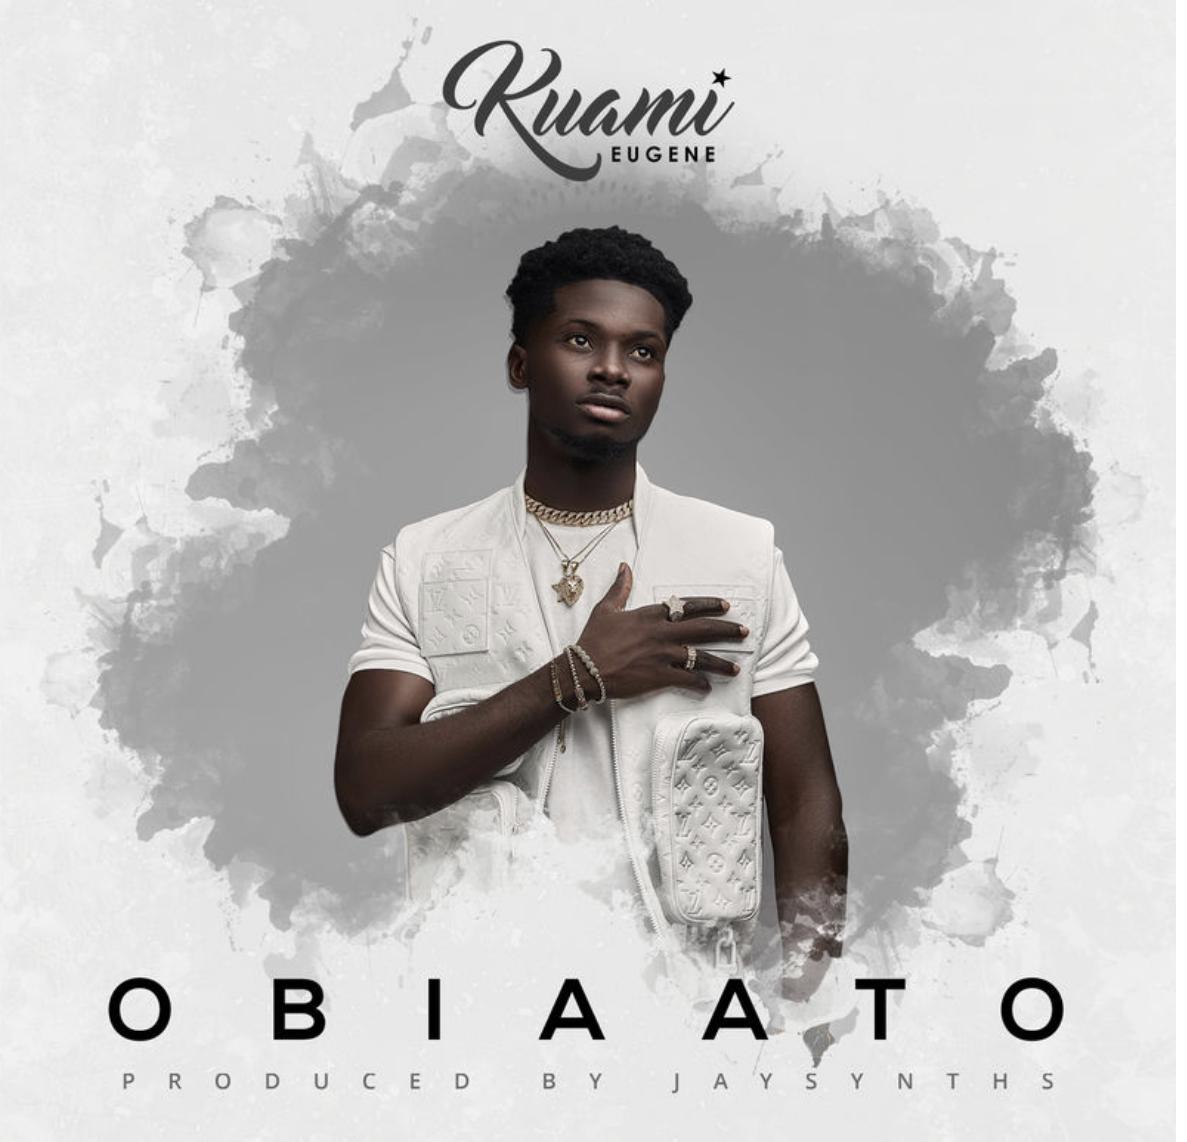 Checkout the lyrics to Obiaato from Kuami Eugene